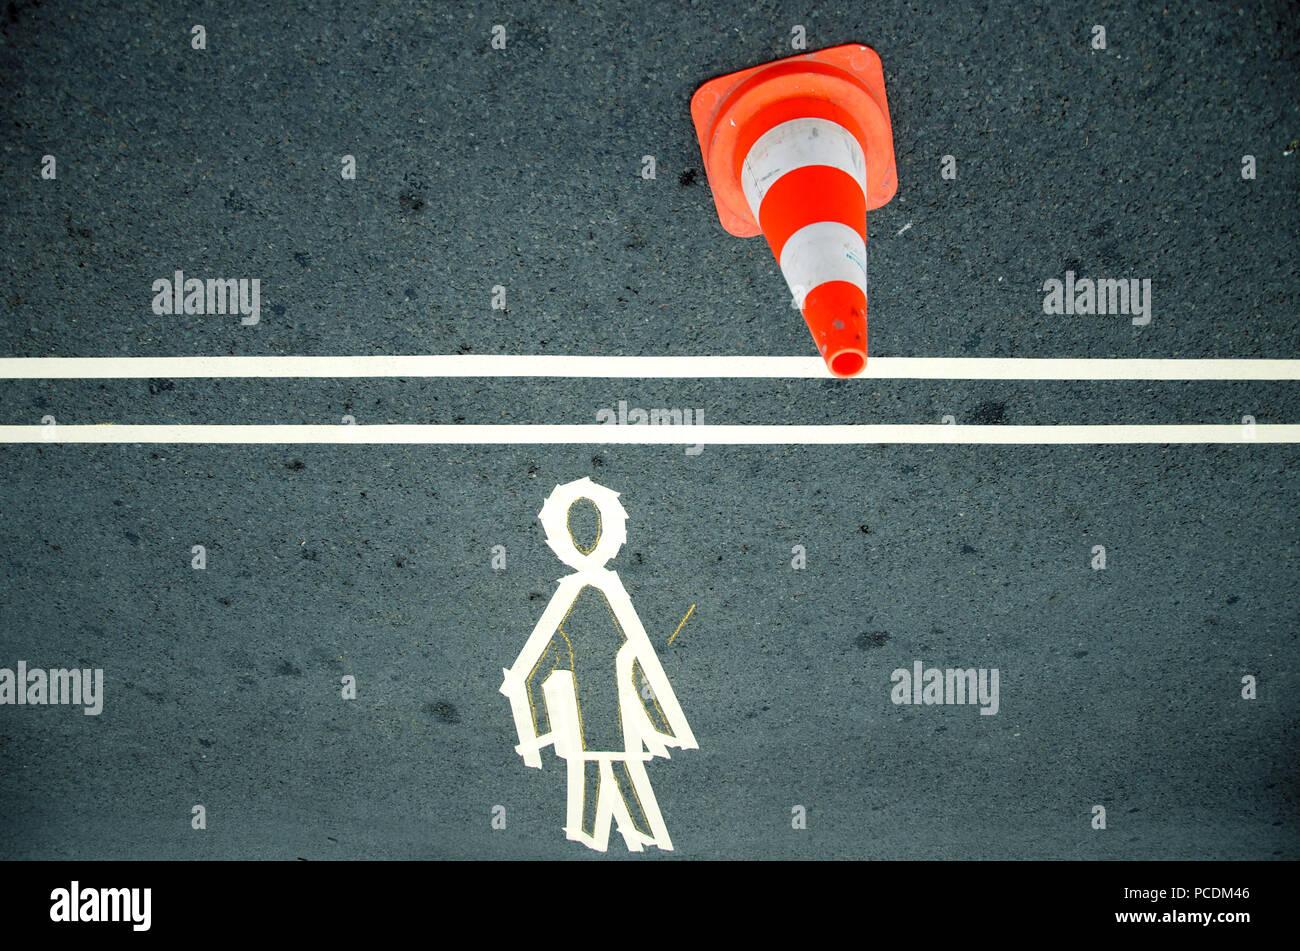 marker,pedestrian,walkway,traffic cone - Stock Image